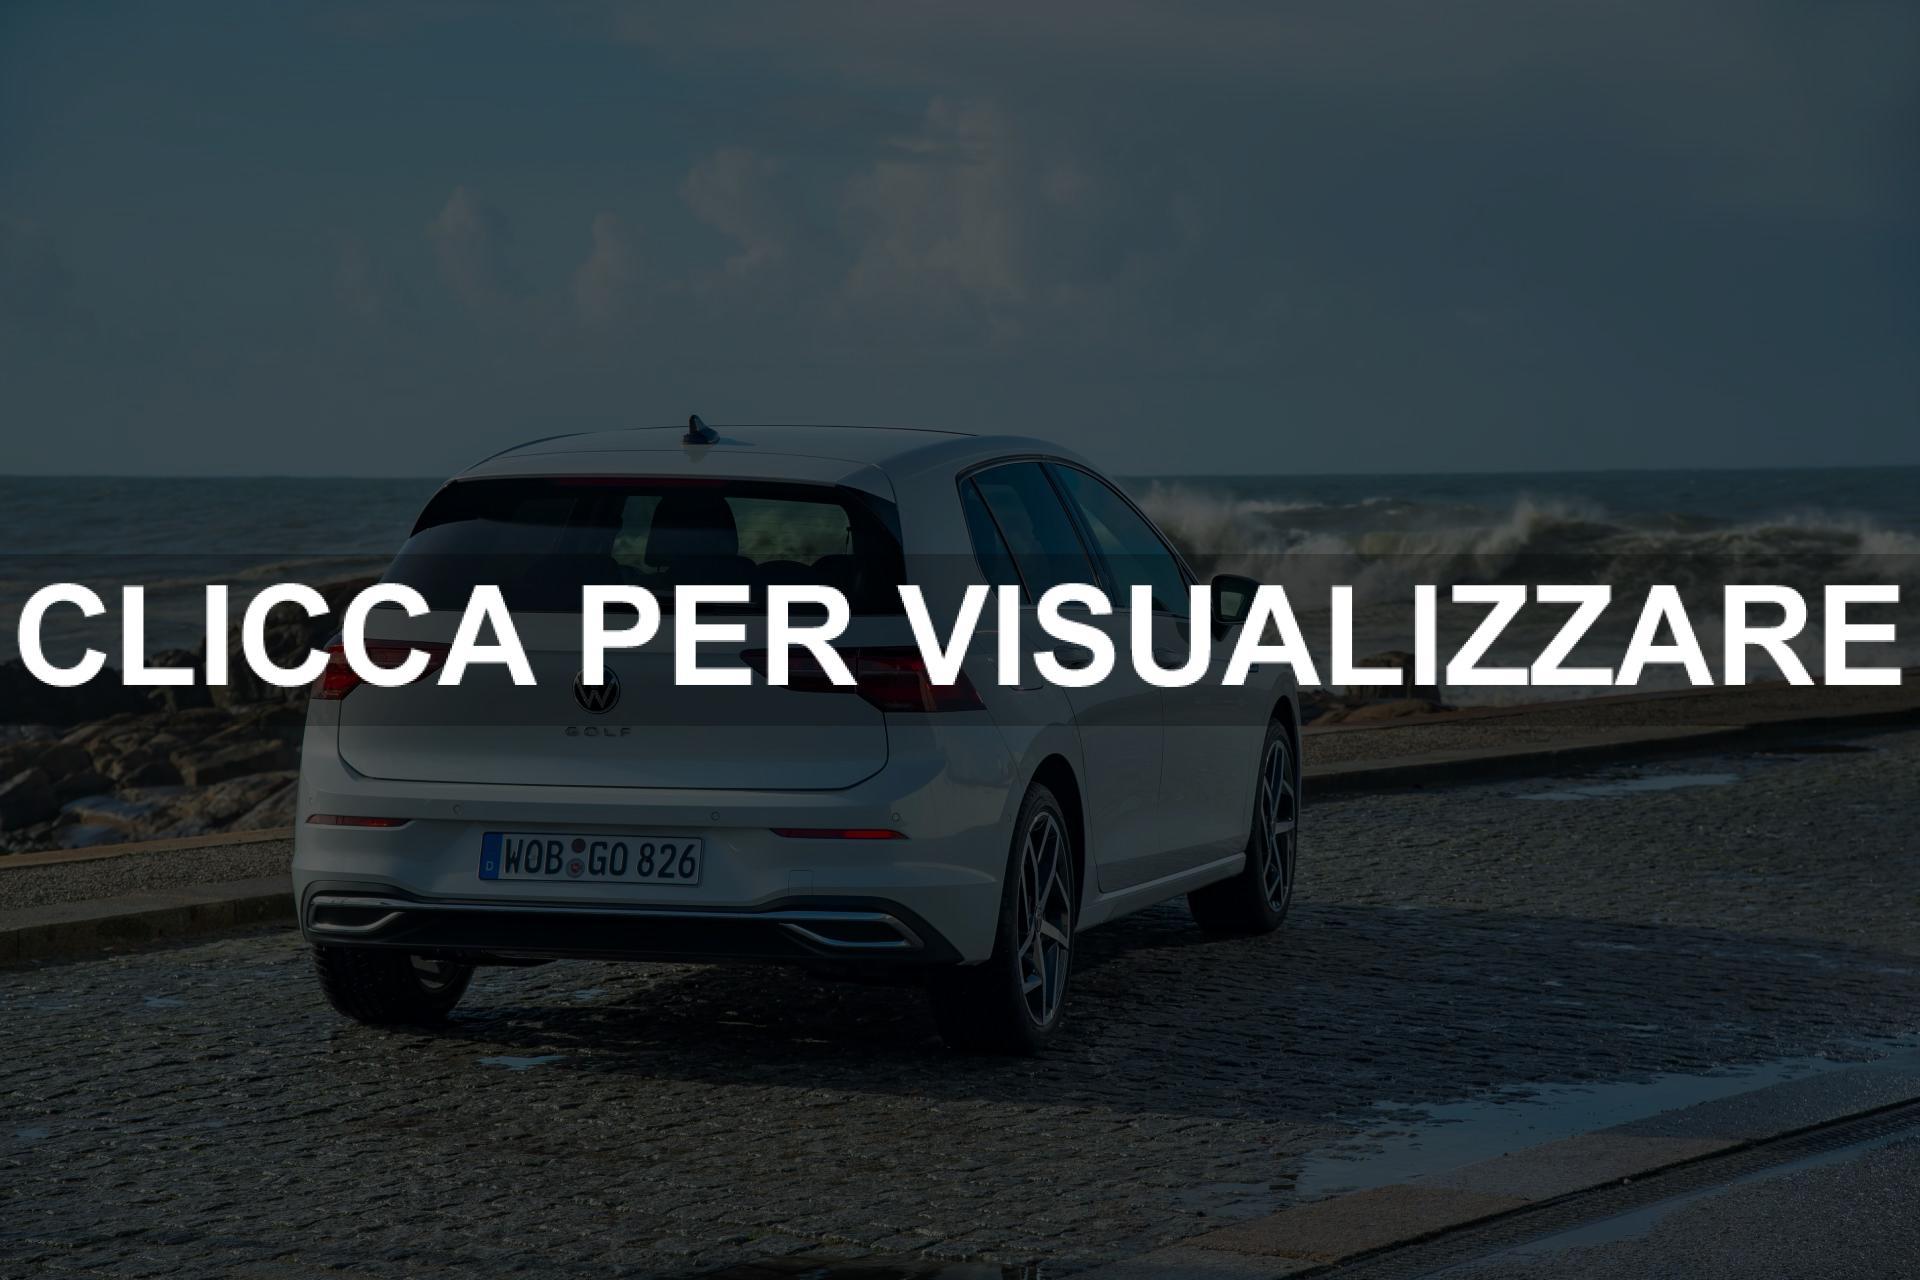 Immagini nuova Volkswagen Golf 2020